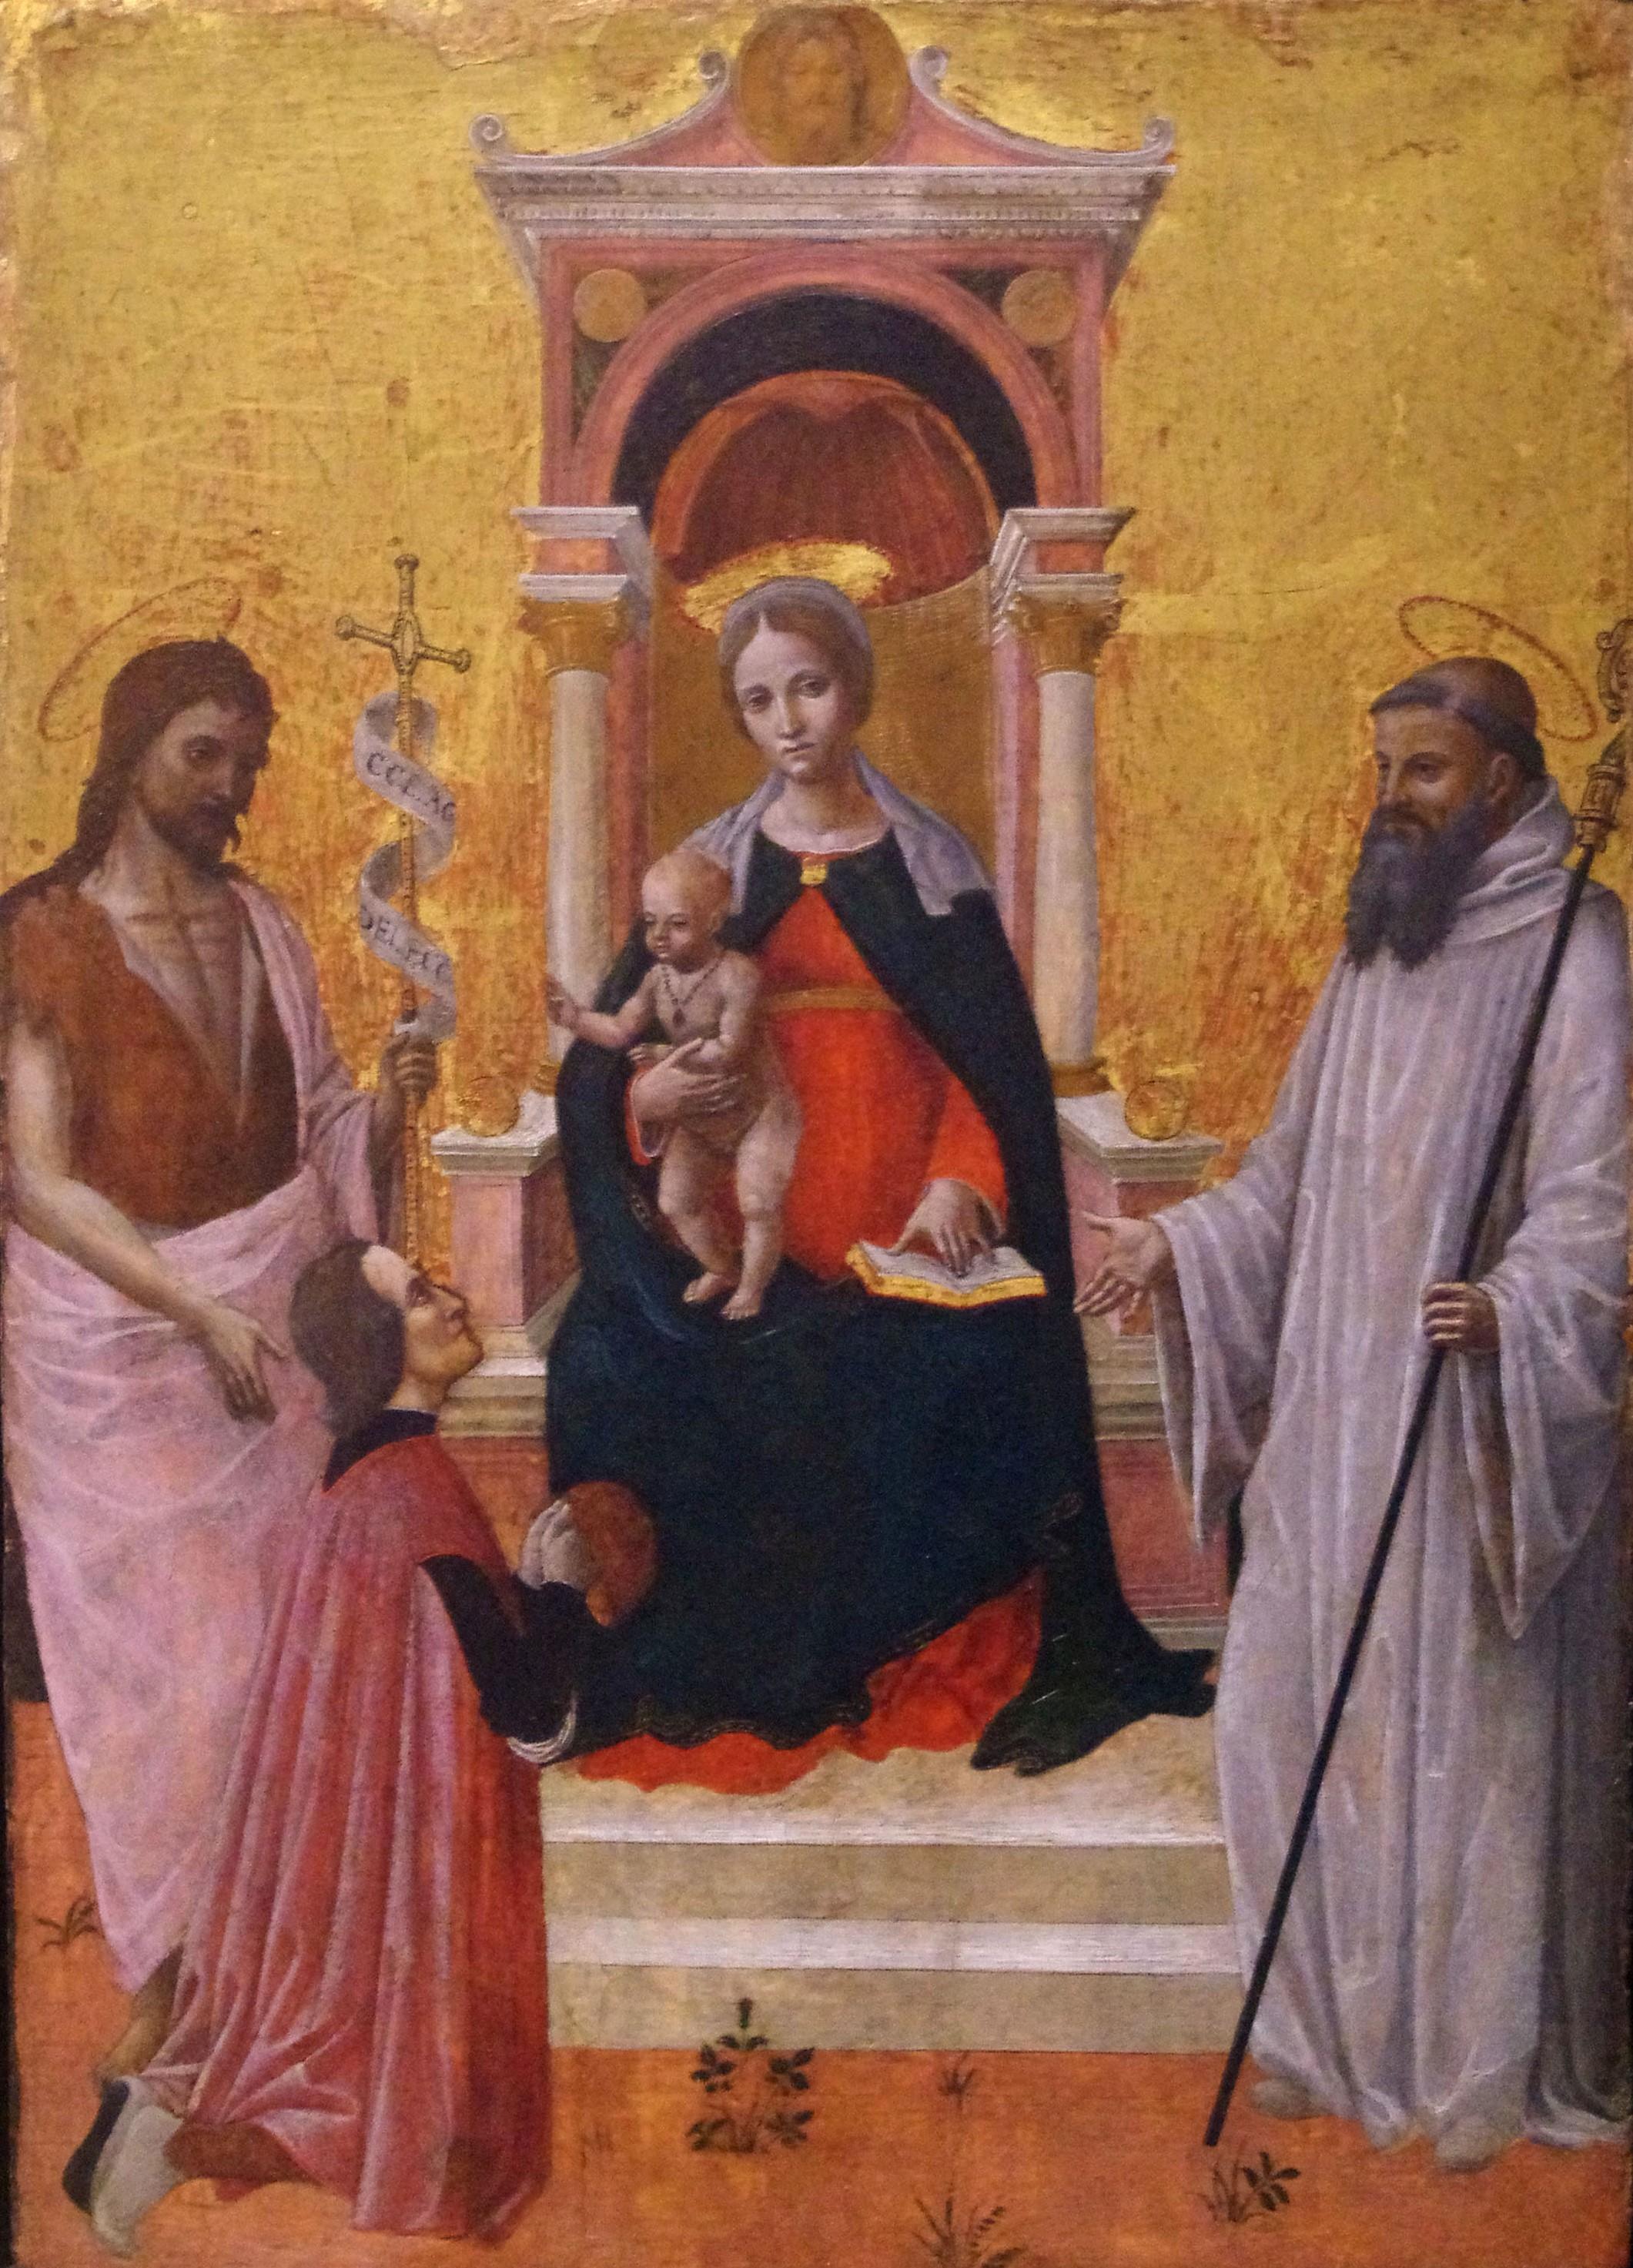 _SVDS 1485-90 Ambrogio Bevilacqua Saint John Baptist, Saint Bernard of Clairveaux and donor Accademia Carrara, Bergame